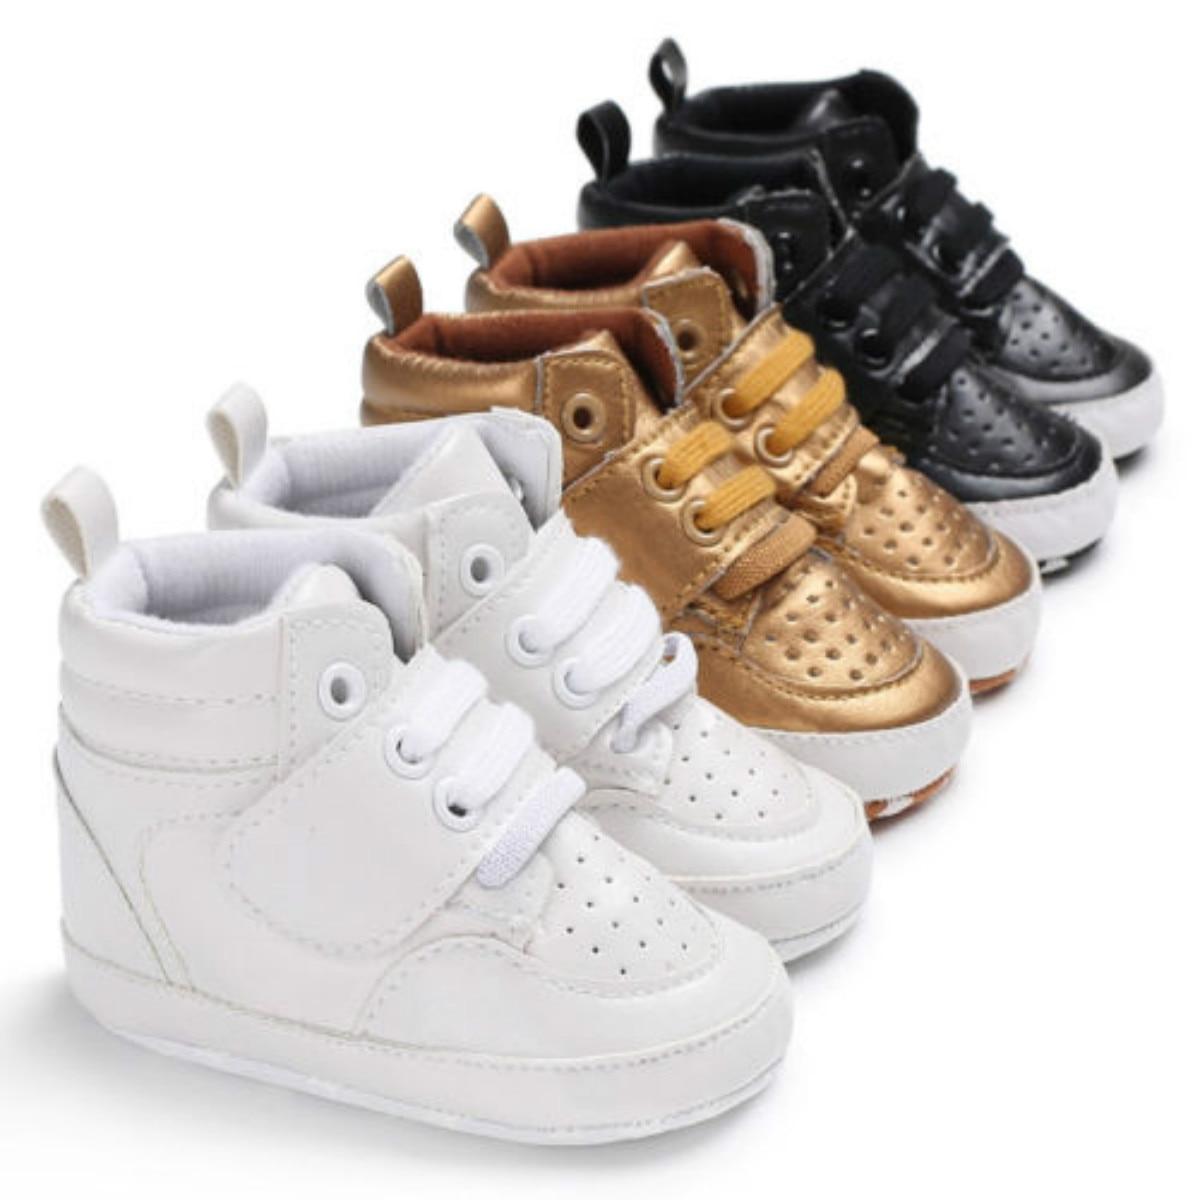 Infant Baby Boy Girl Soft Cloth Sole Anti Slip Crib Shoes Unisex Daily Prewalker